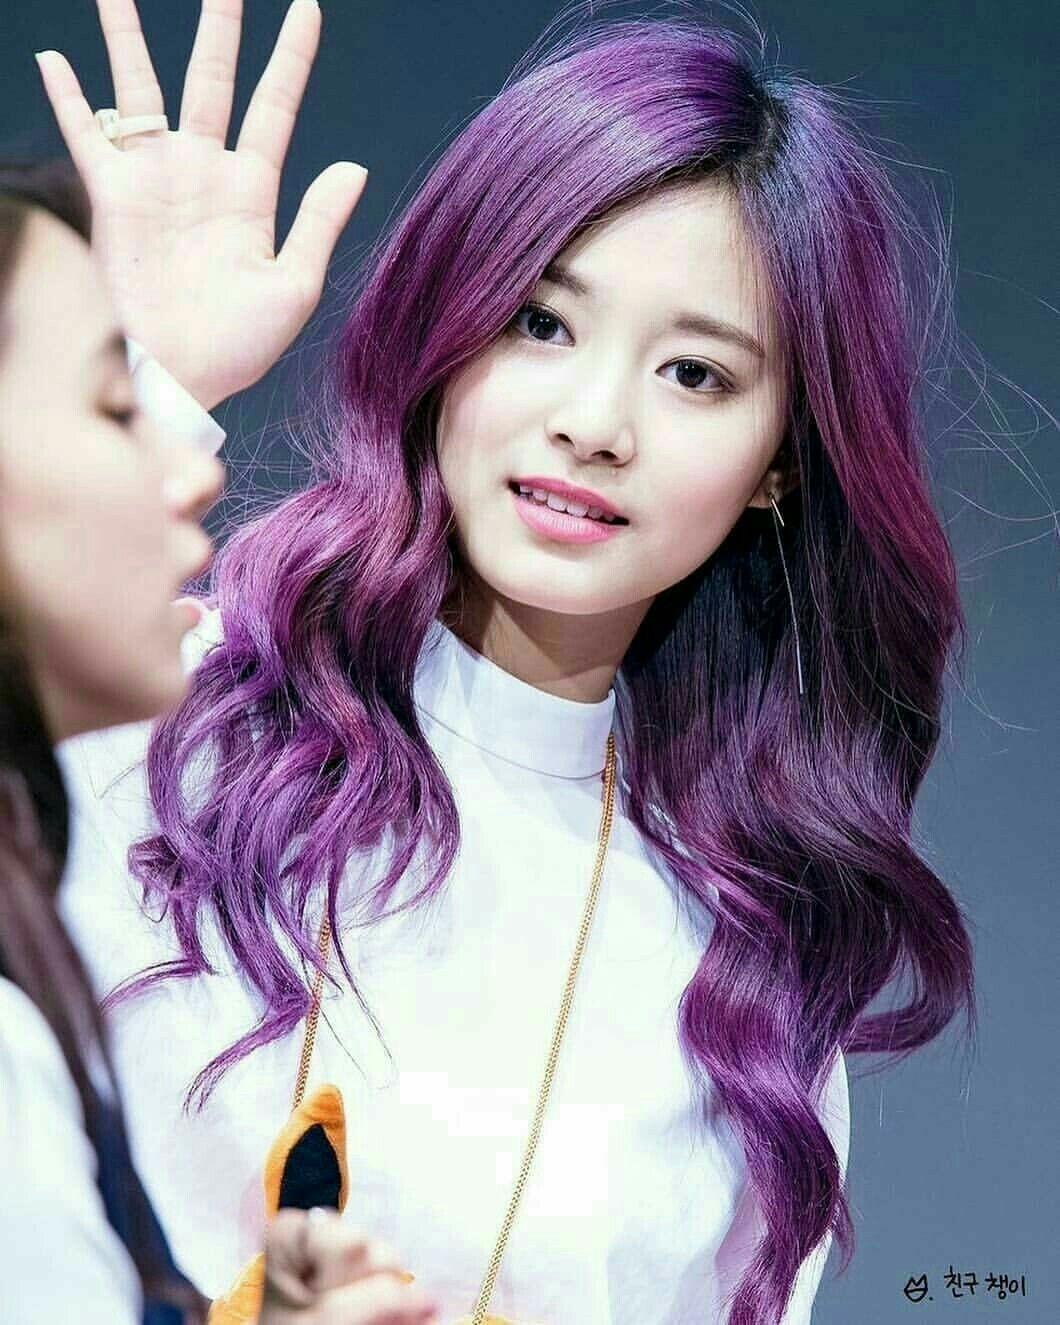 Pin By Cheyenne On Coisas Aleatorias Que Eu Vi E Gostei Kpop Hair Color Purple Hair Korean Hair Color